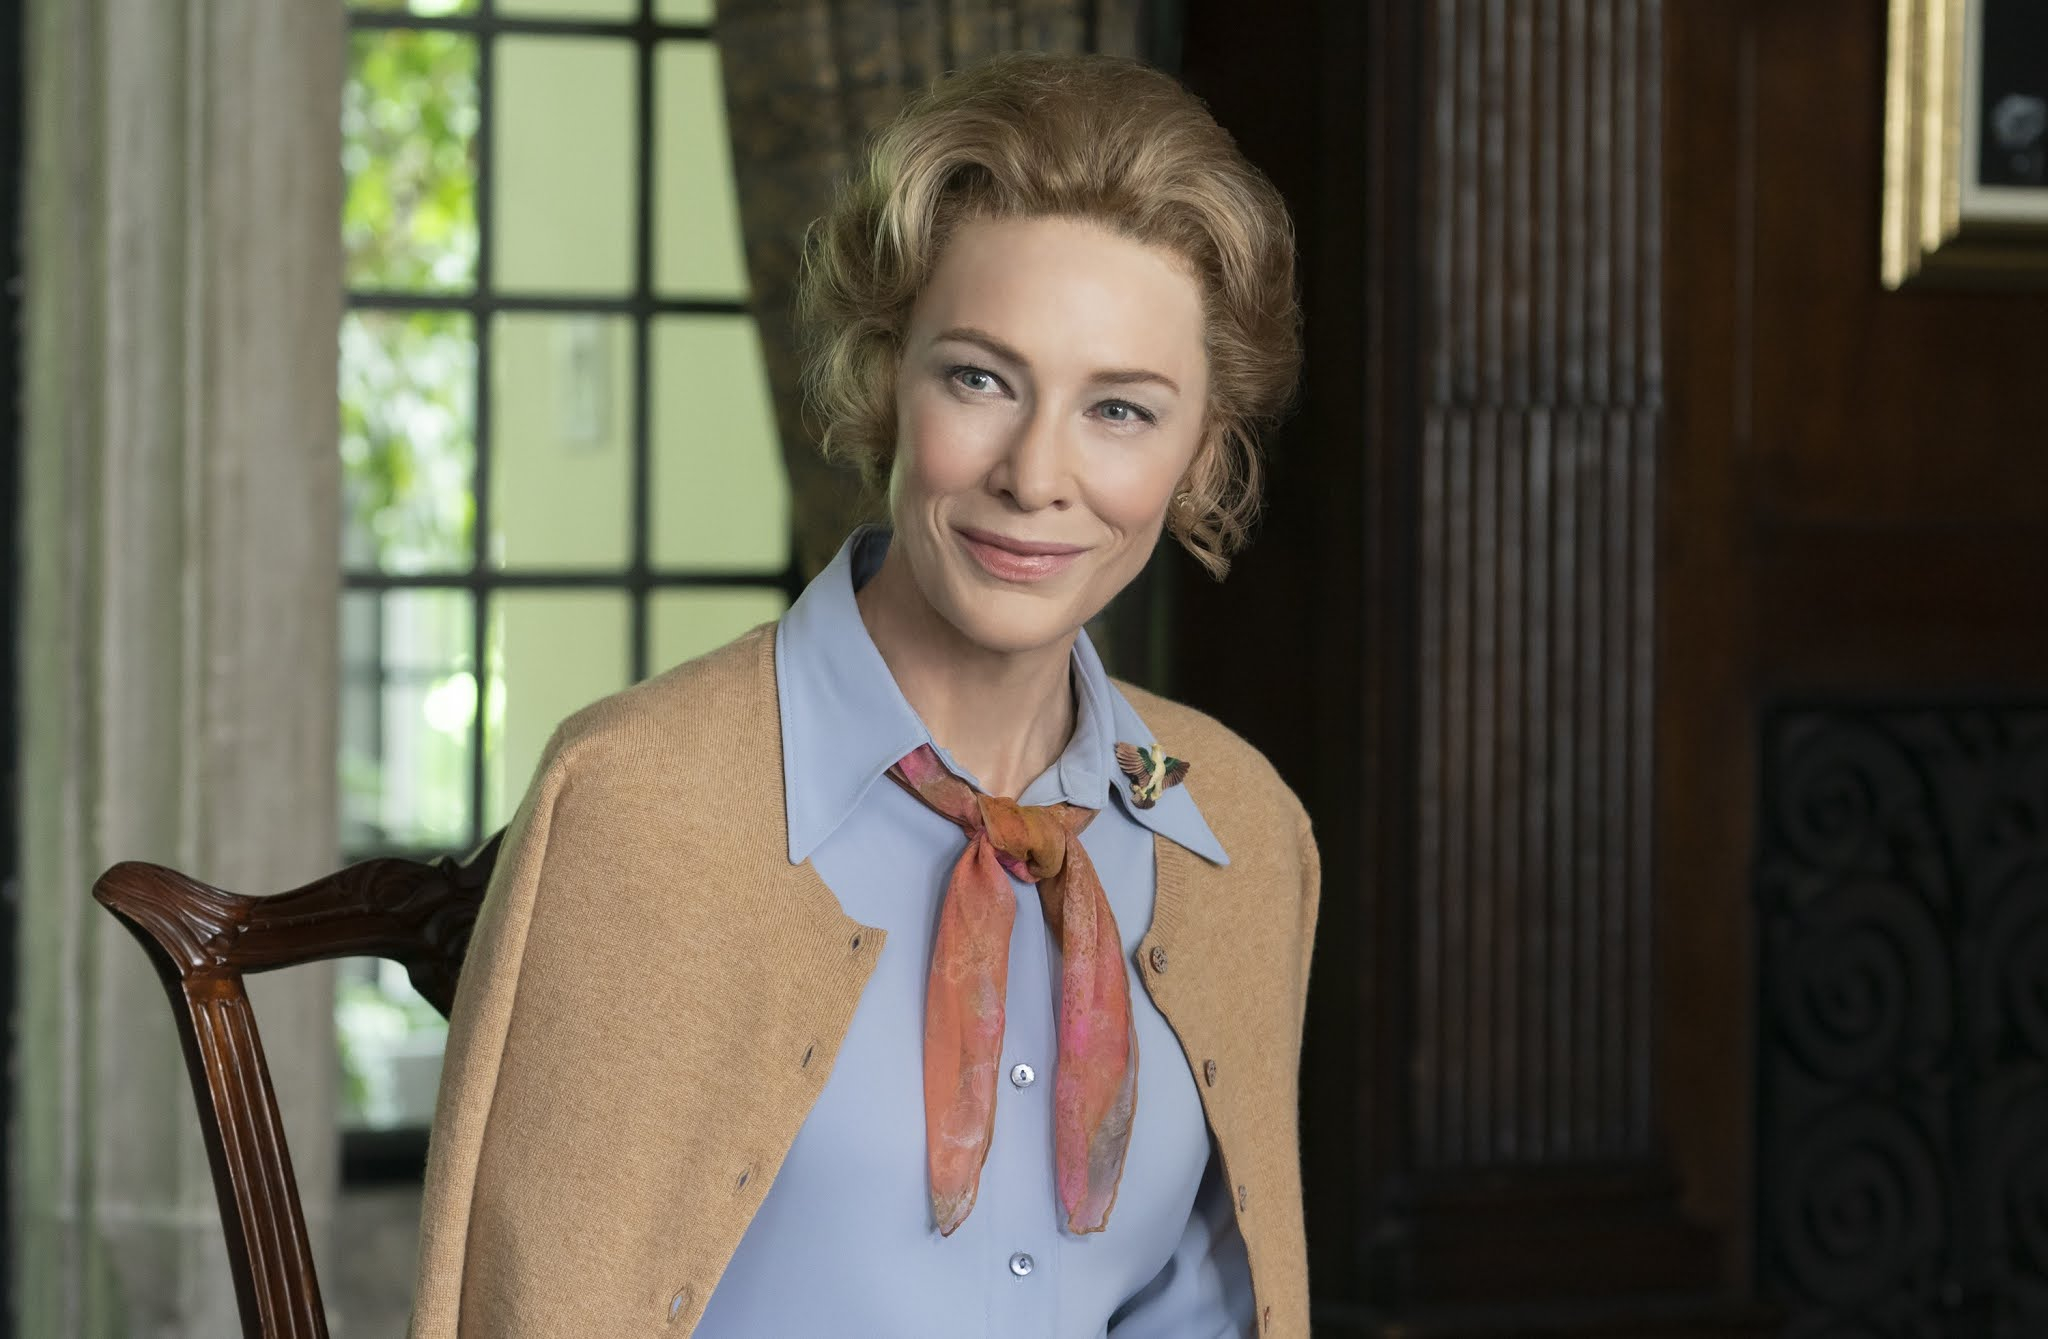 Phyllis Schlafly de Mrs. America